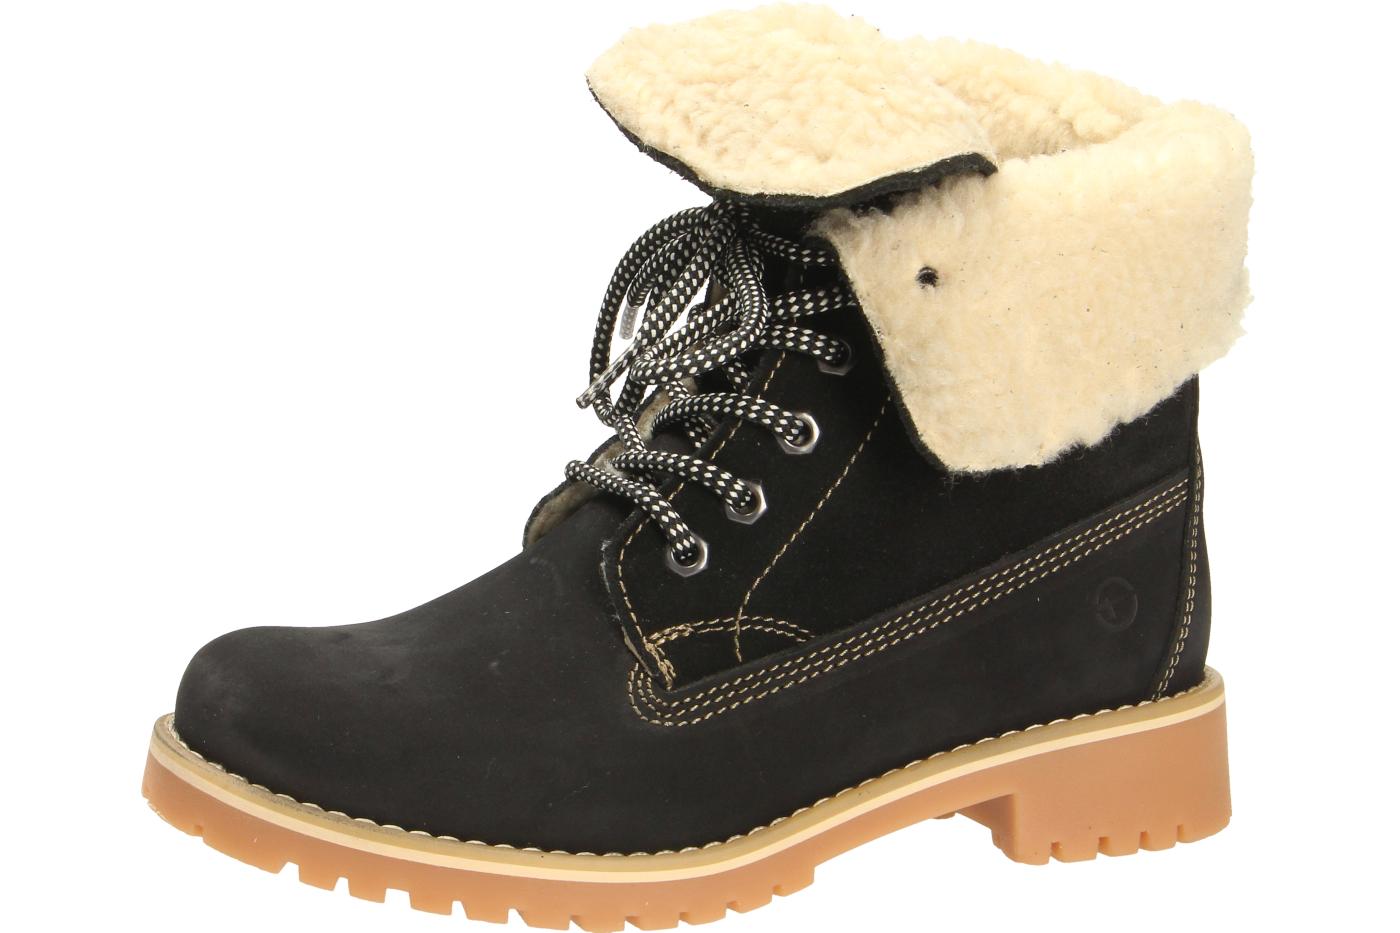 Rieker Stiefelette Schuhe Damen Warmfutter Stiefel Damenschuhe Schwarz  L4691-01